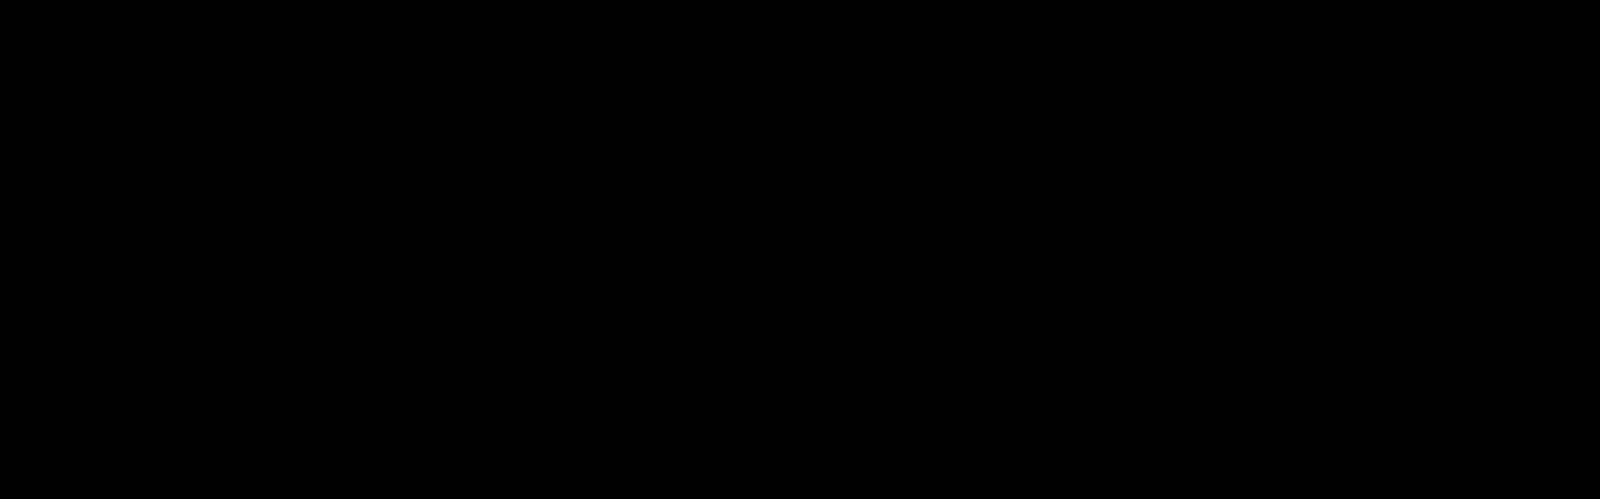 1600x499 Lines Clipart Swirl